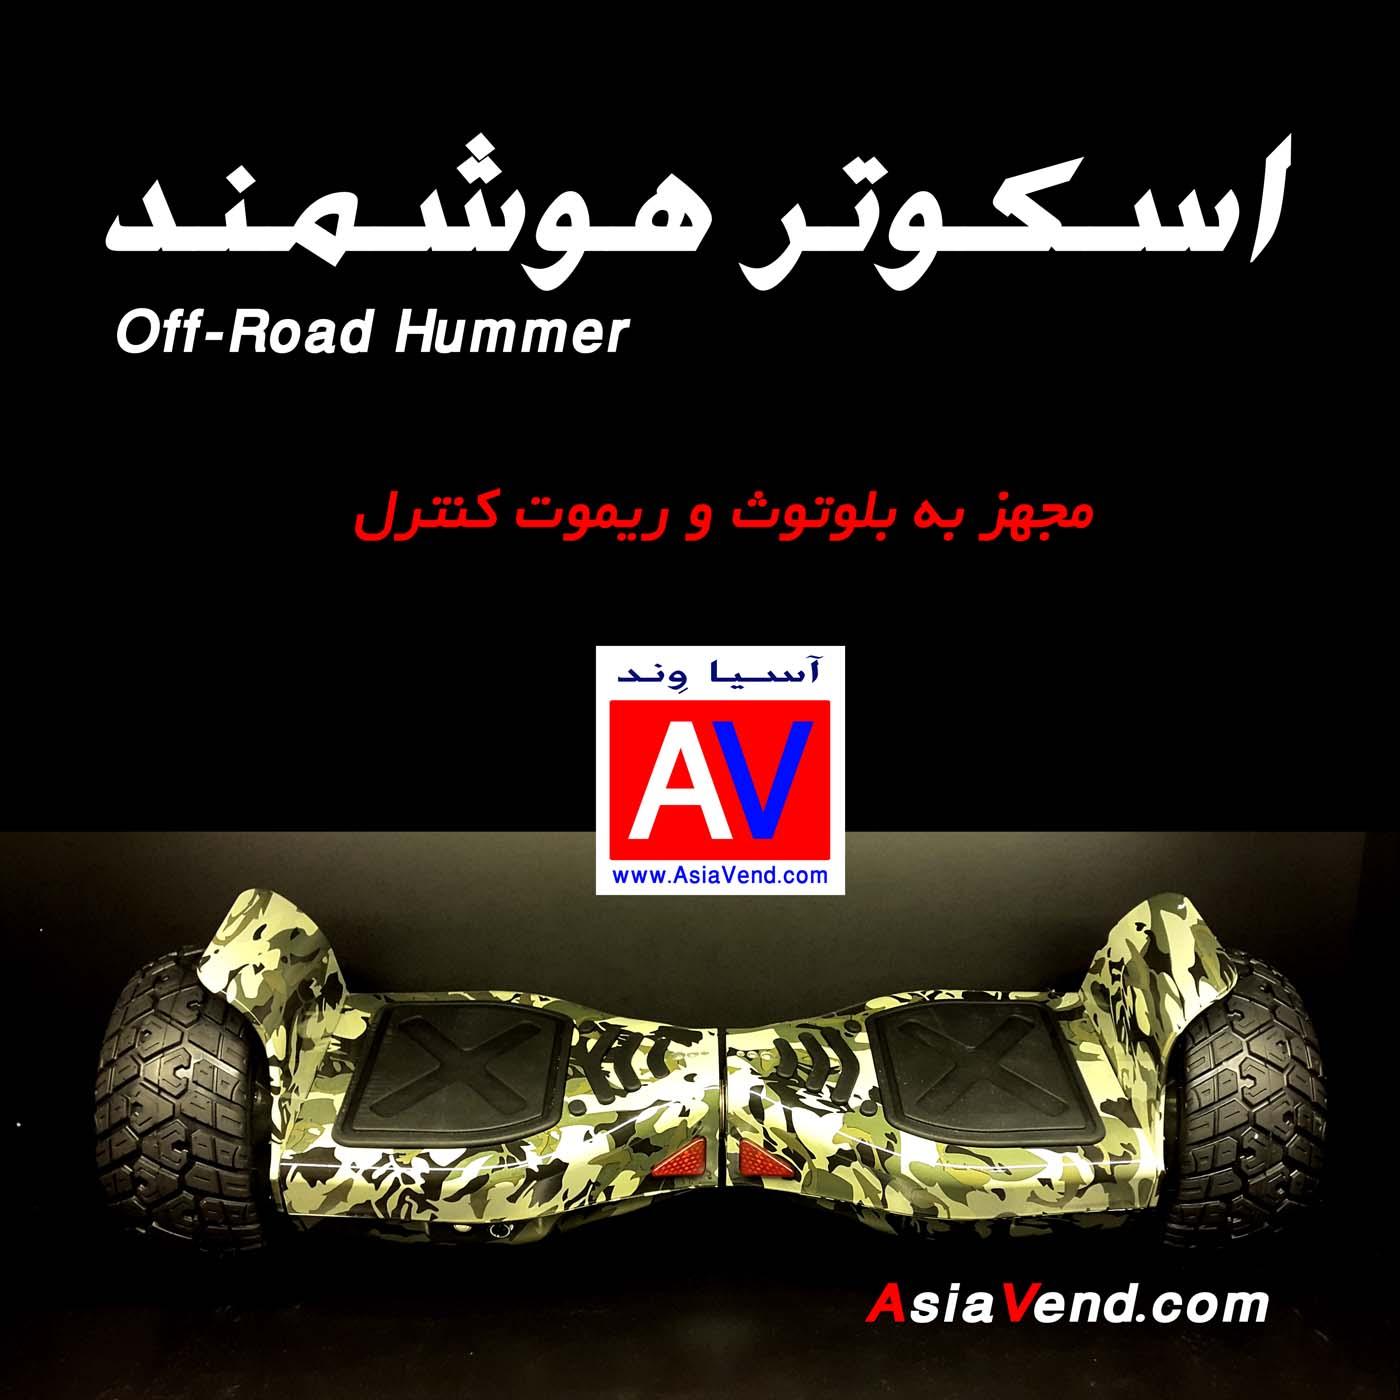 8 inch hummer smart scooter wheel price اسکوتر برقی آفرود اسمارت بالانس ویل مدل  Hummer Offroad Self Balance Wheel